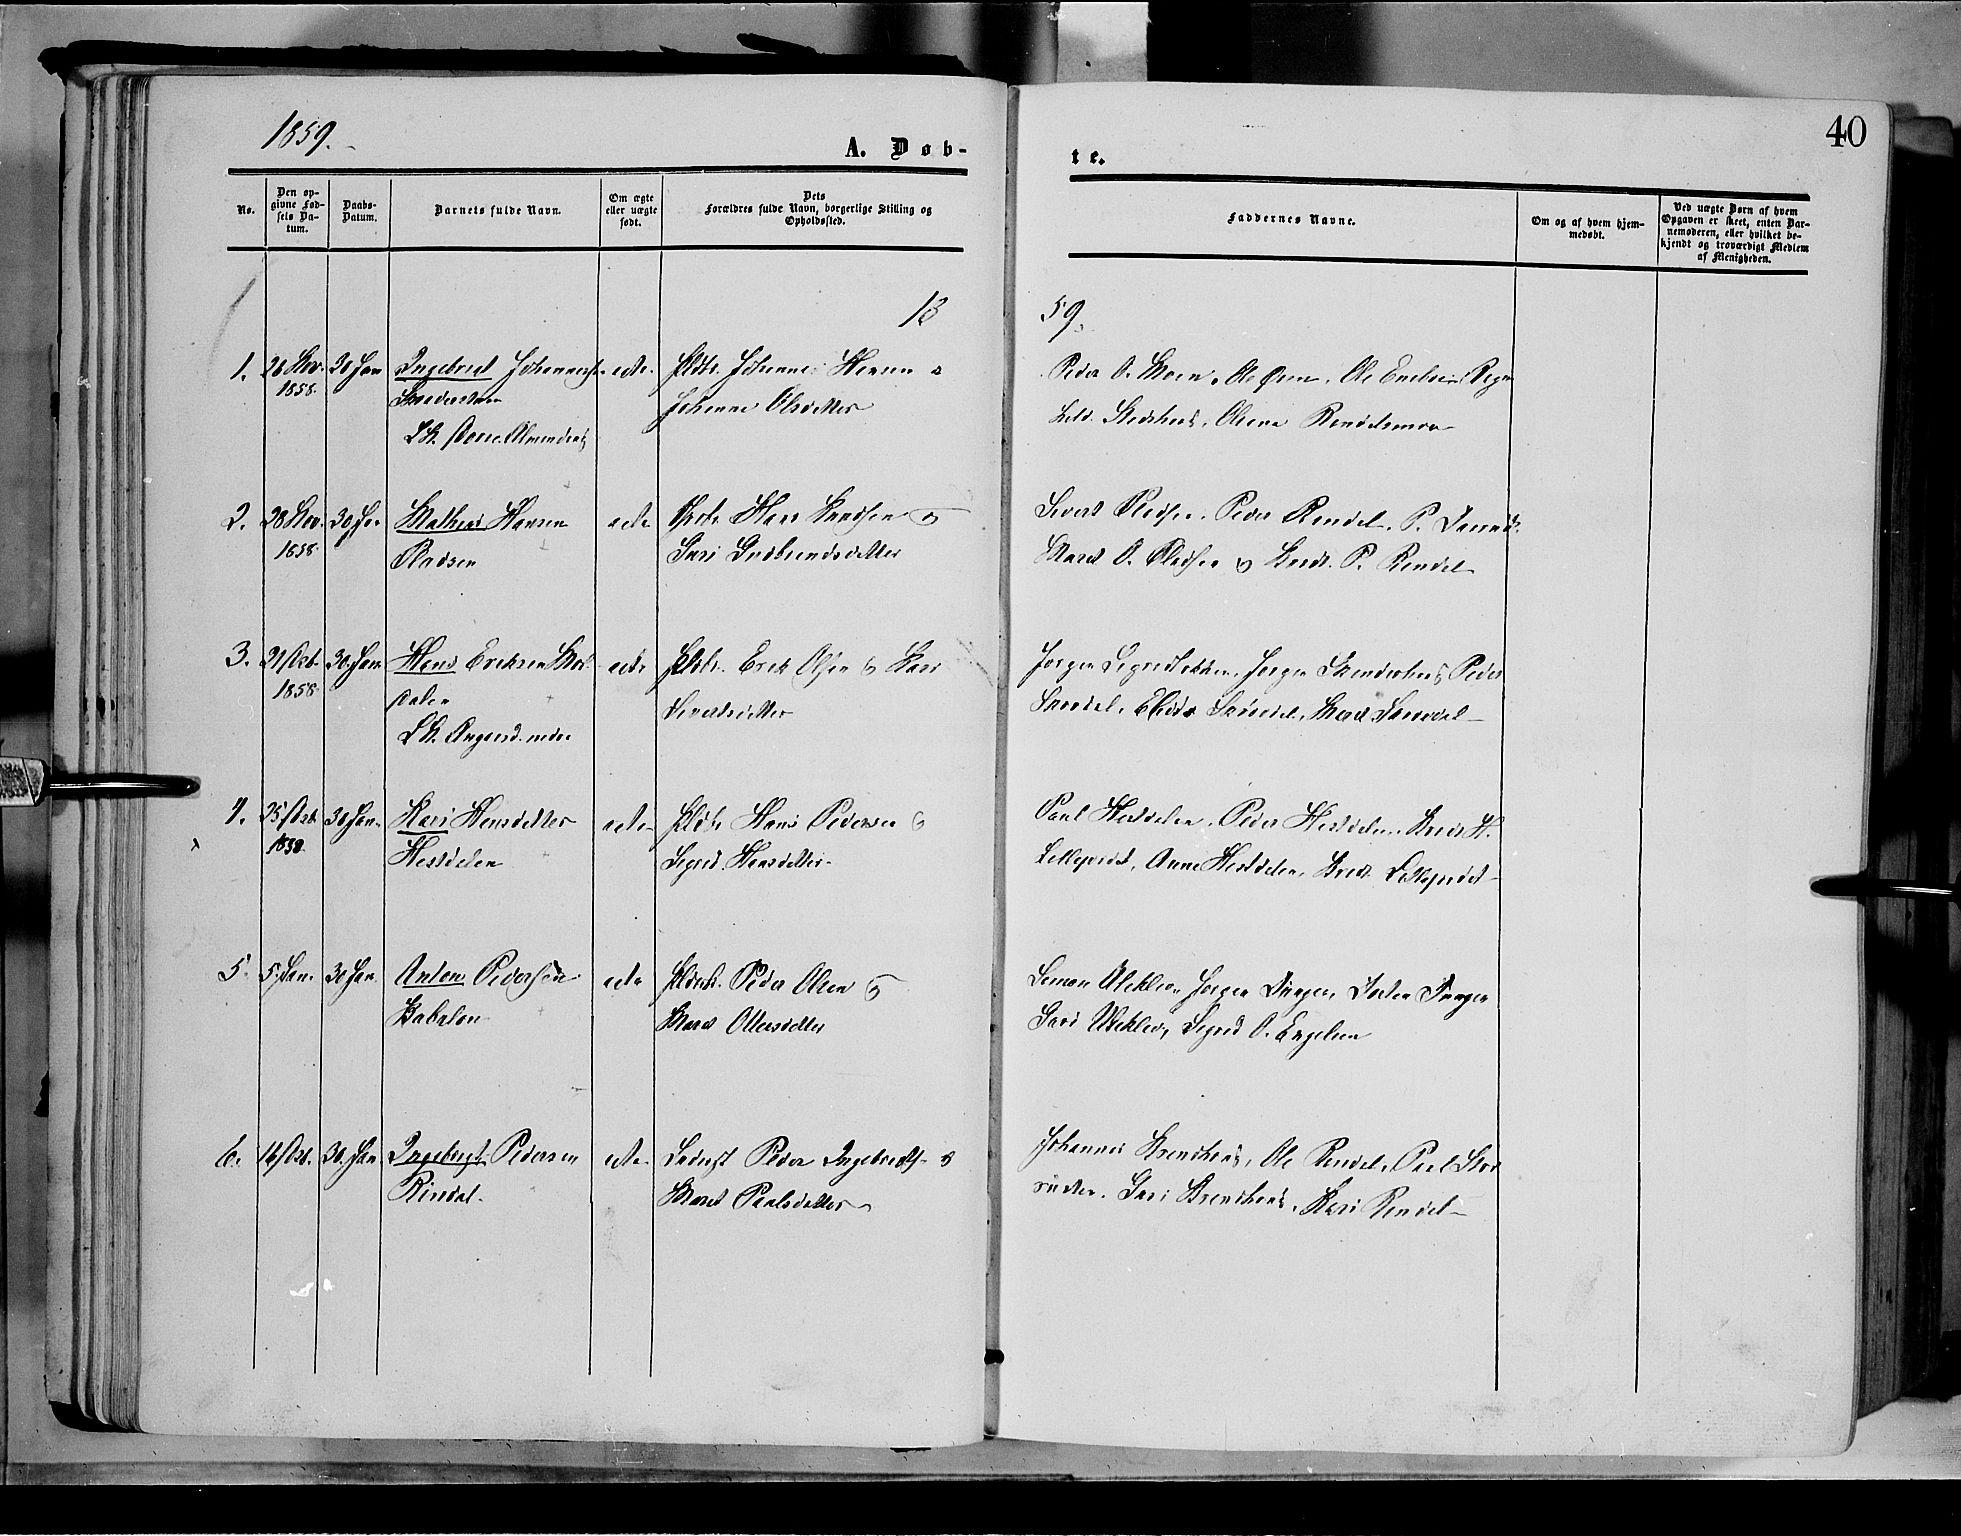 SAH, Dovre prestekontor, Ministerialbok nr. 1, 1854-1878, s. 40